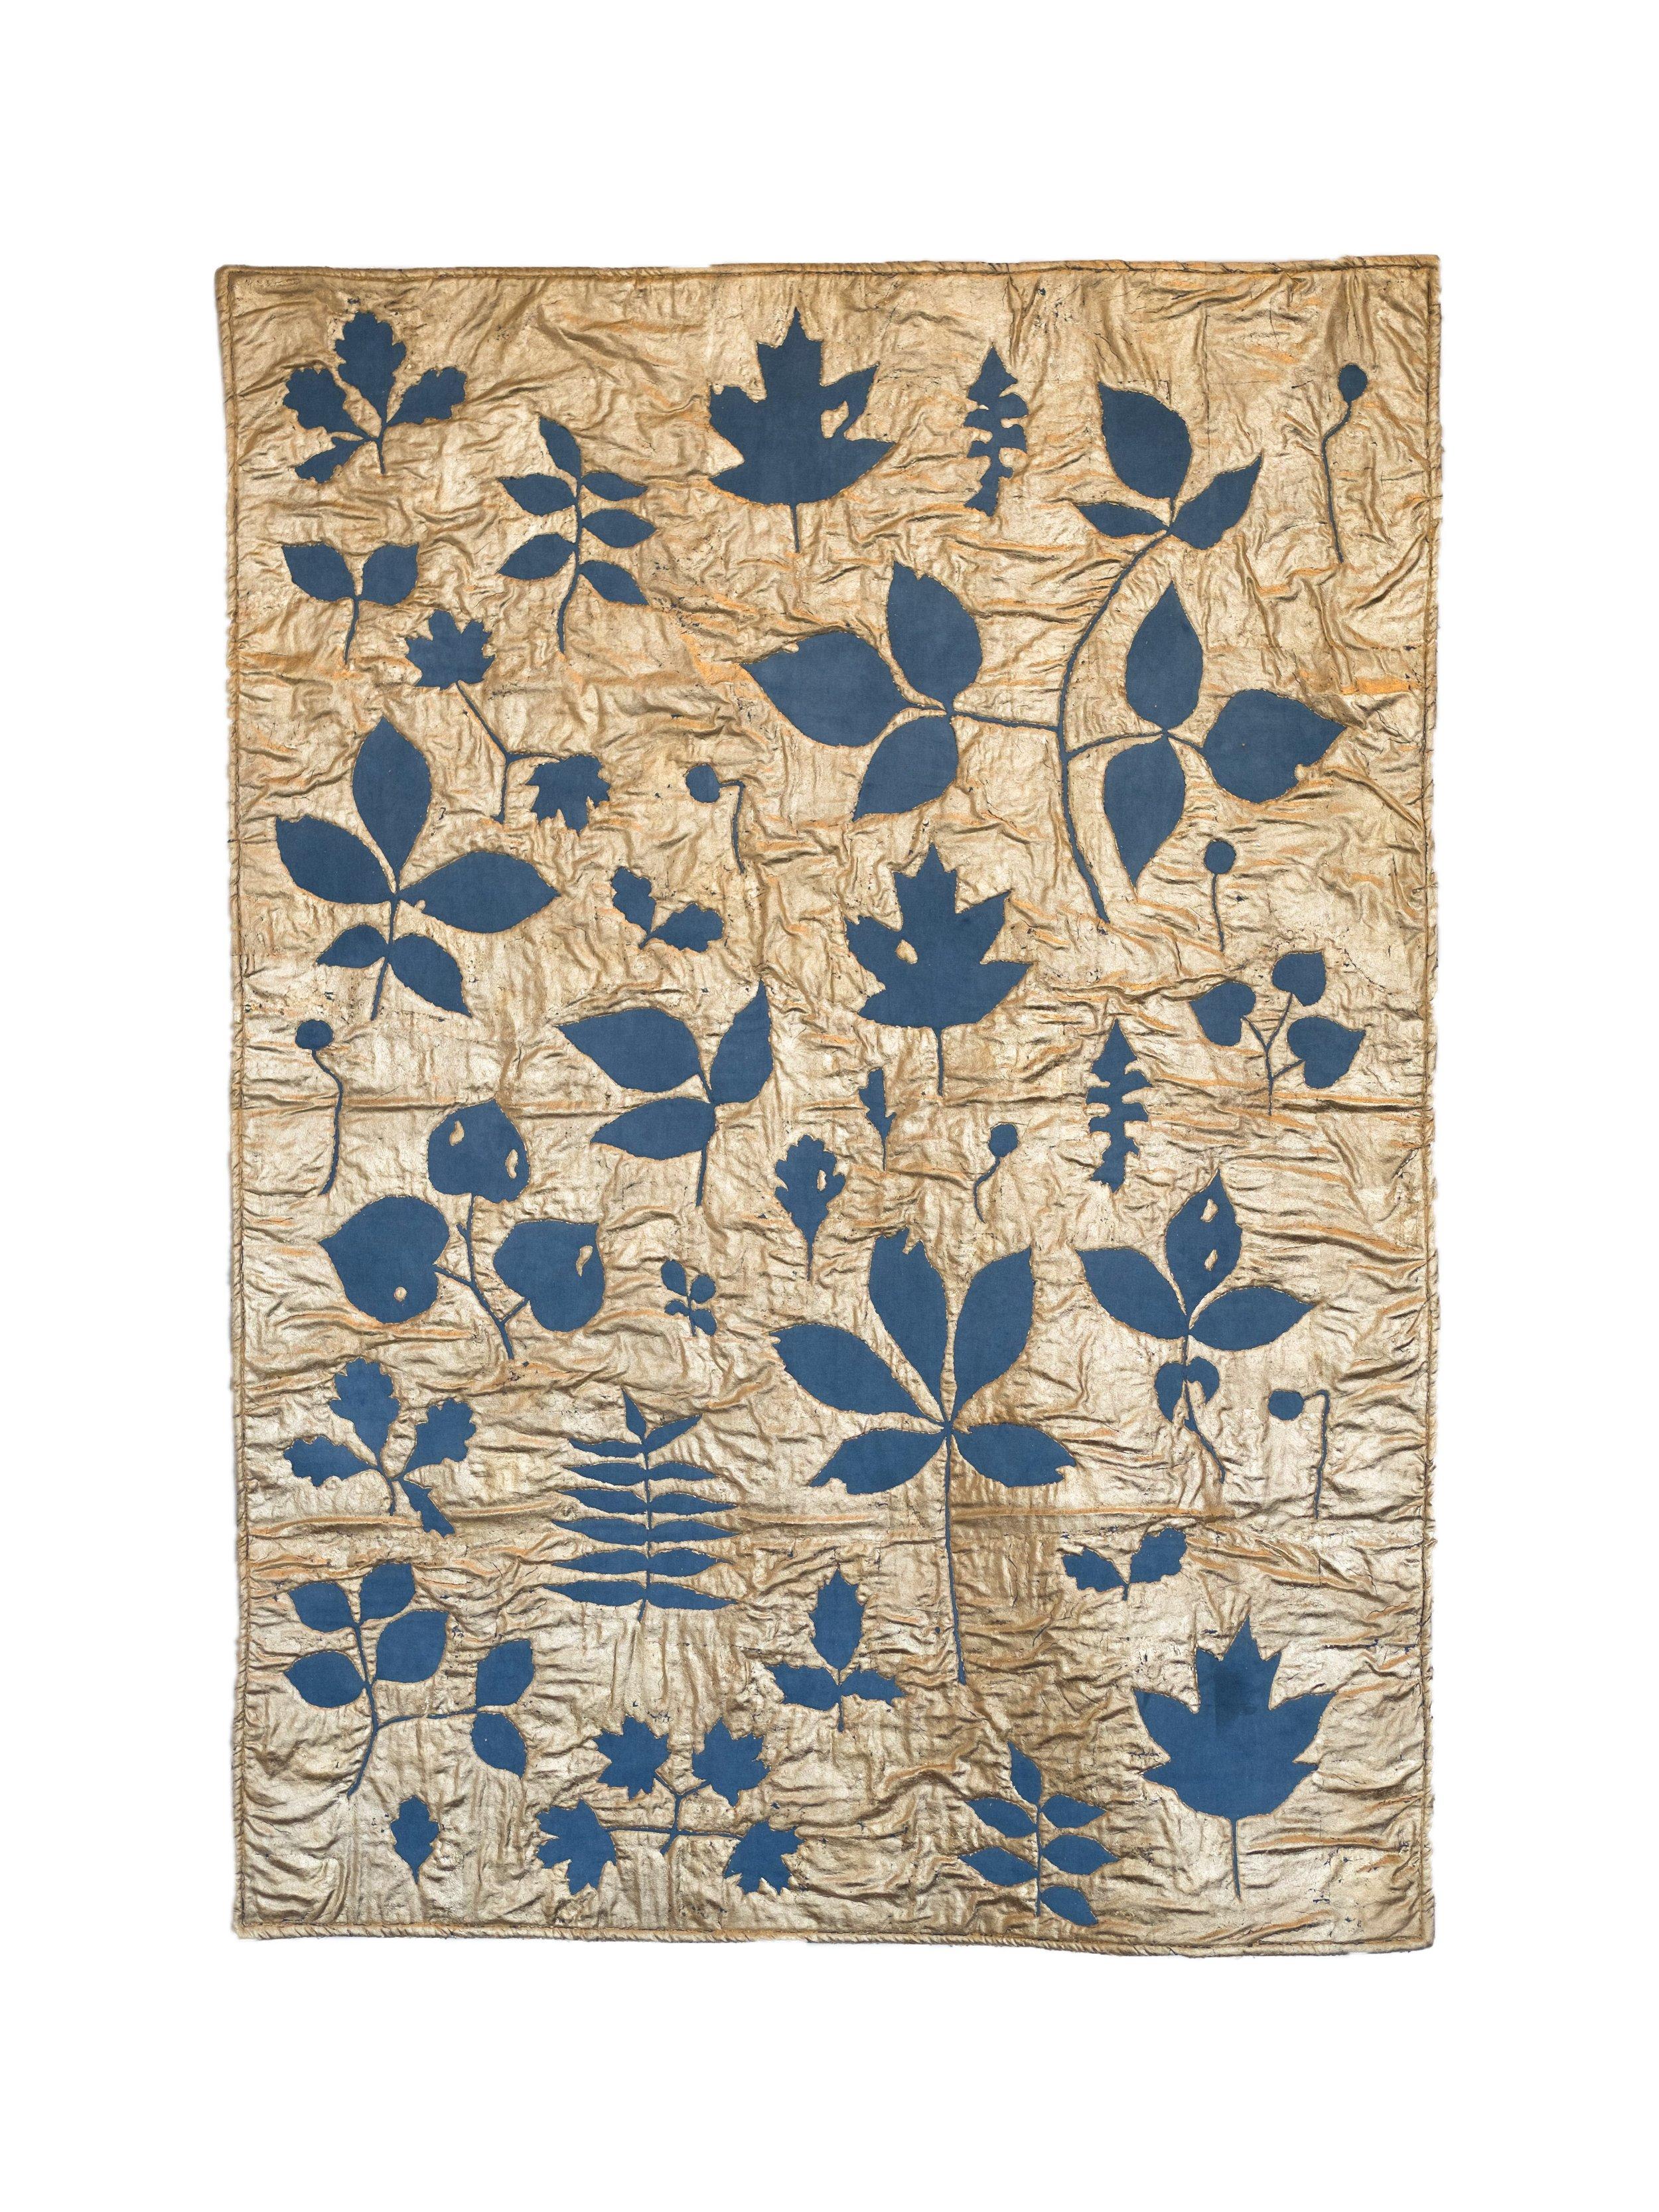 Leaves in Indigo Blue